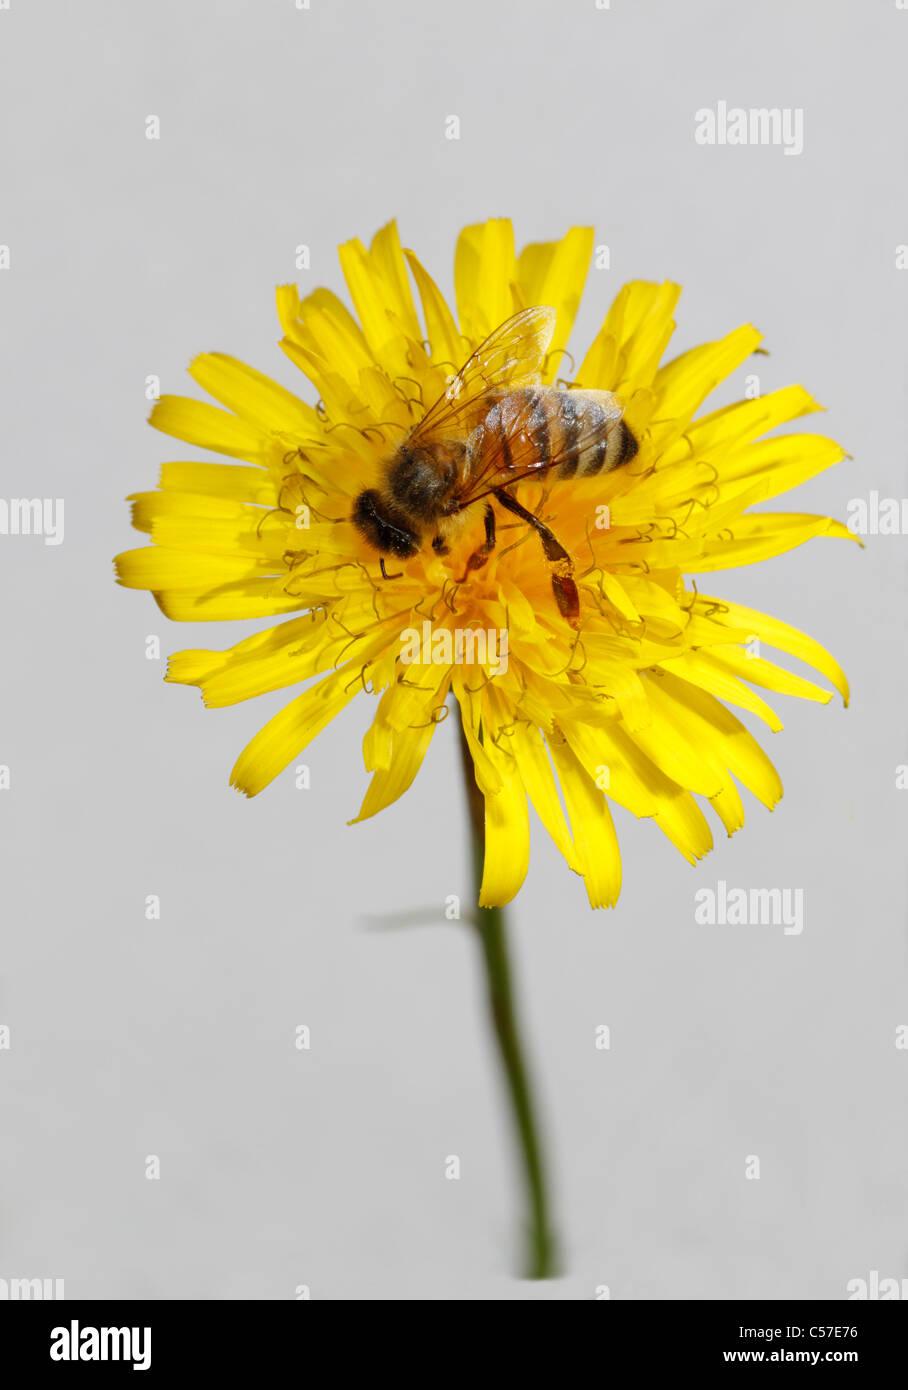 Honey bee on Dandelion. - Stock Image